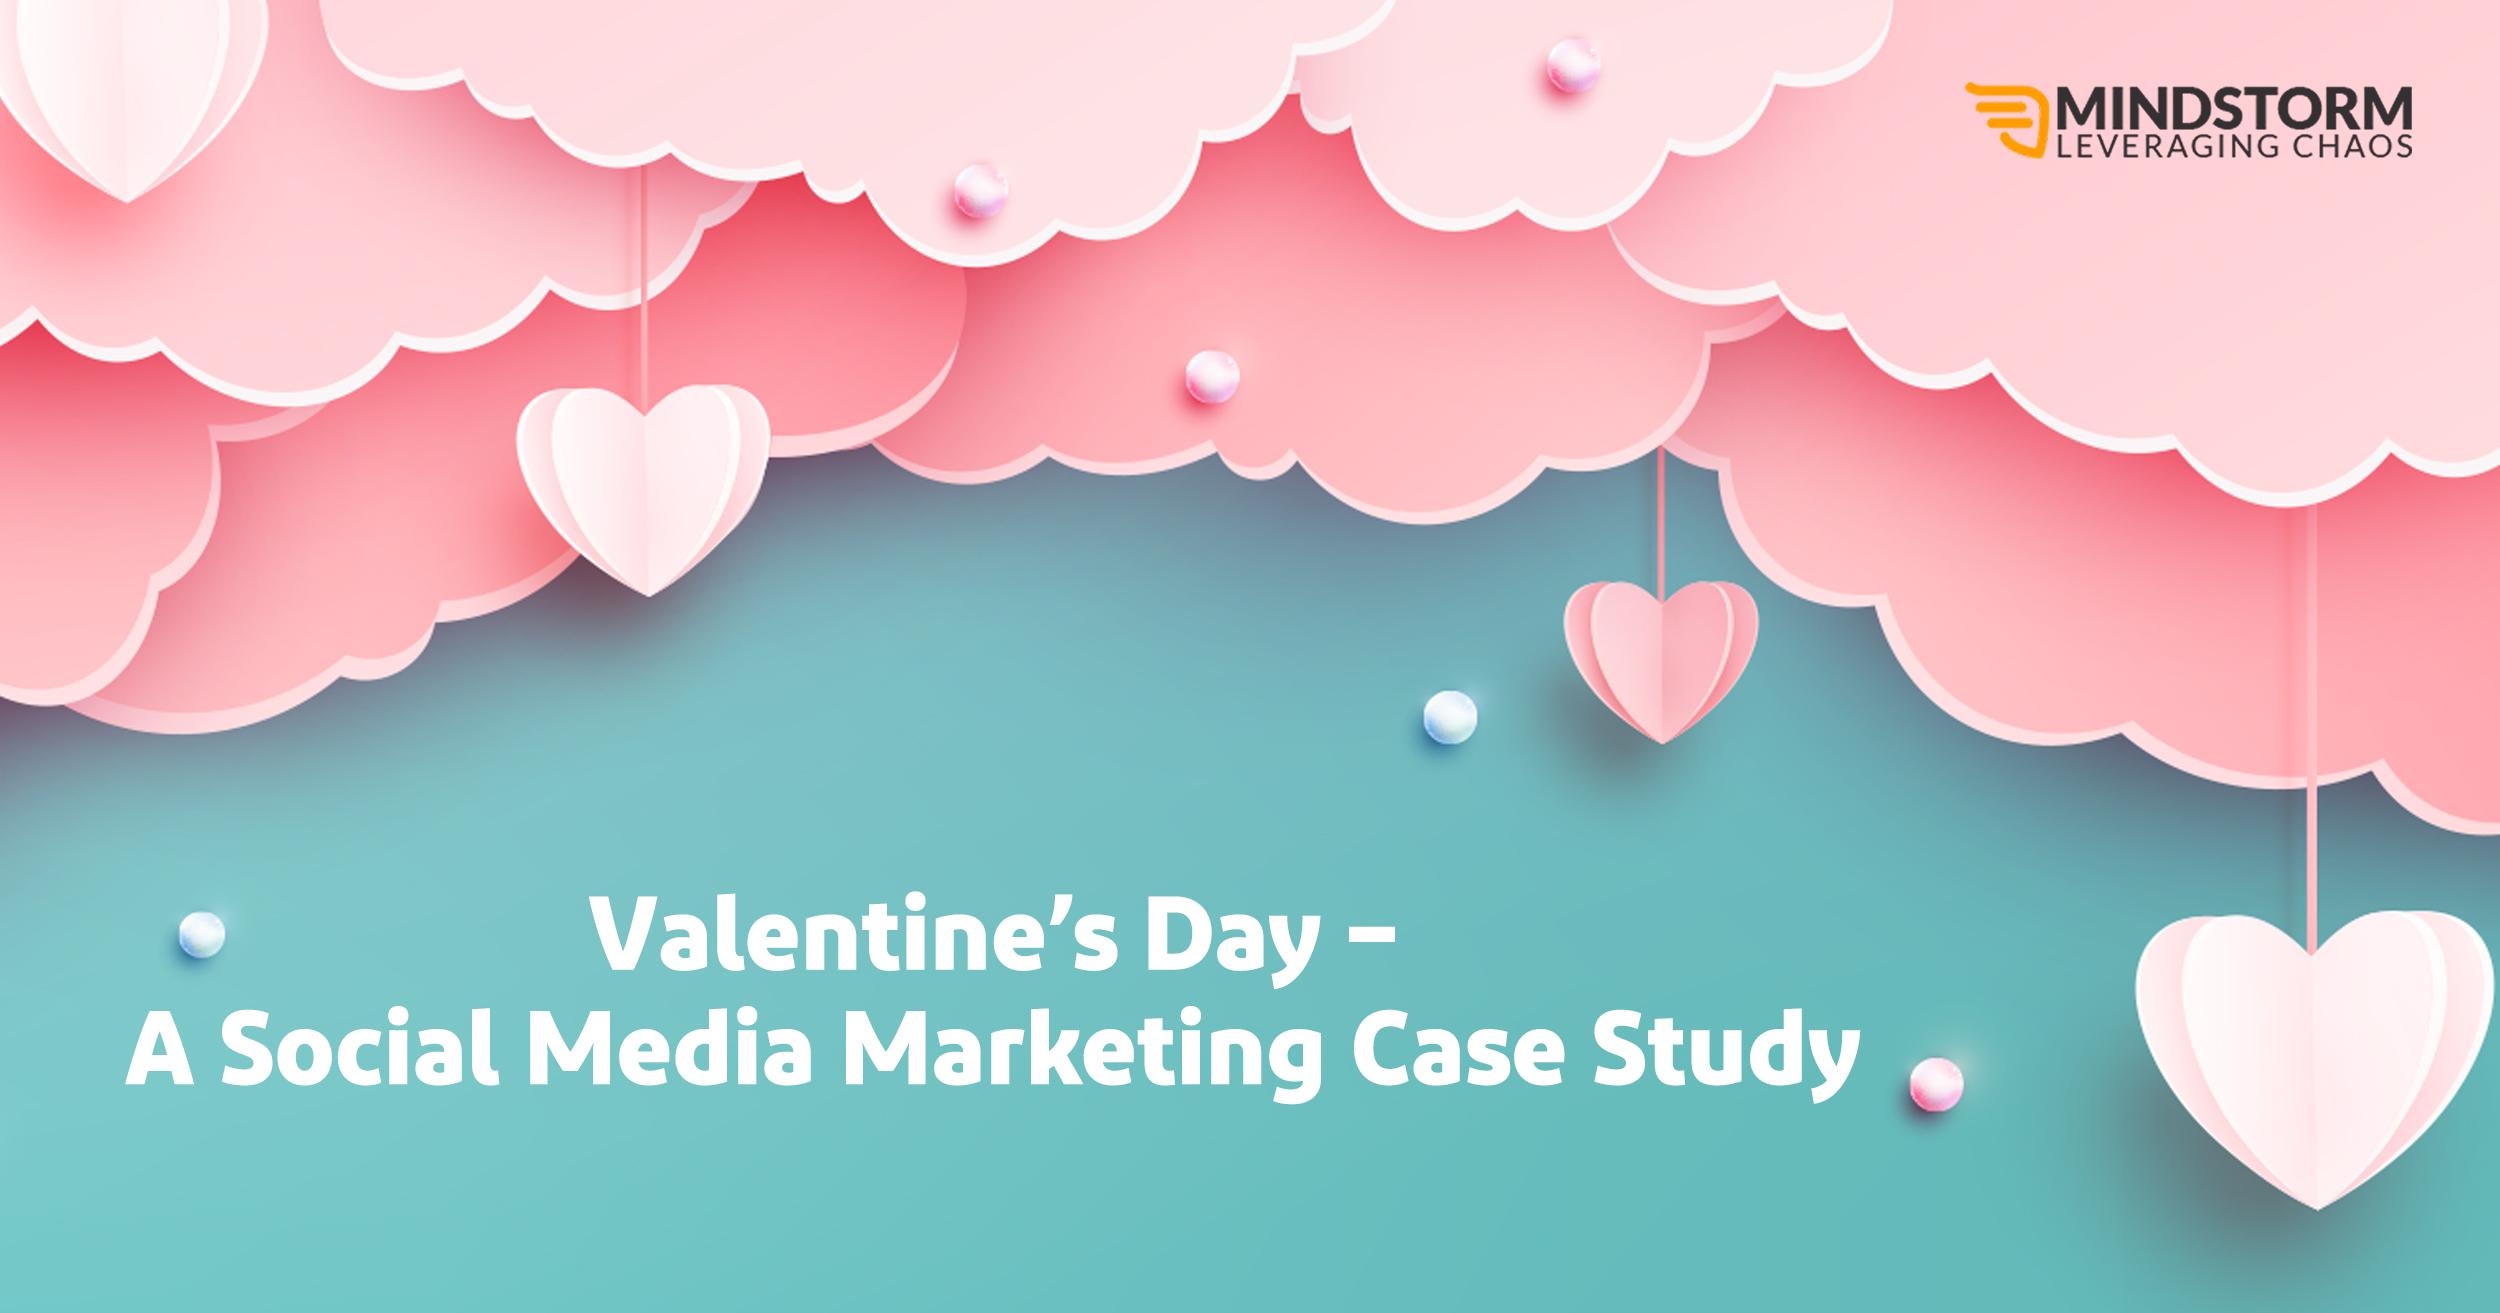 Valentine's Day- A Social Media Marketing Case Study